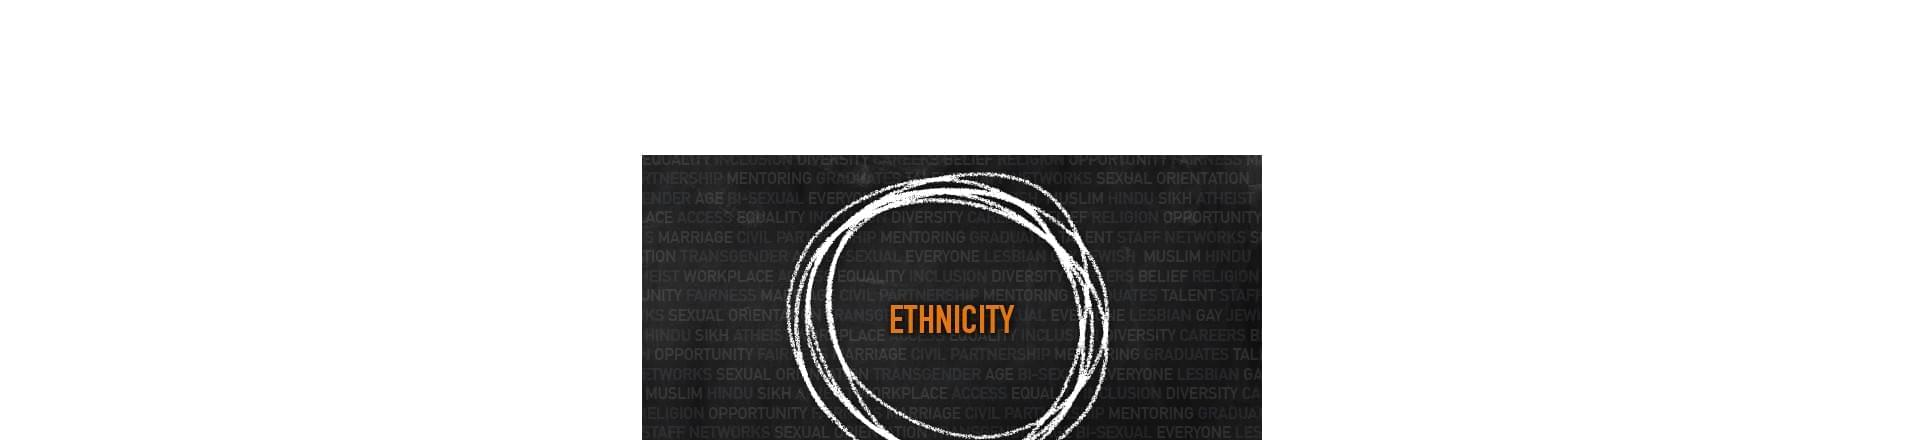 thebigidea branded image with words Ethnicity